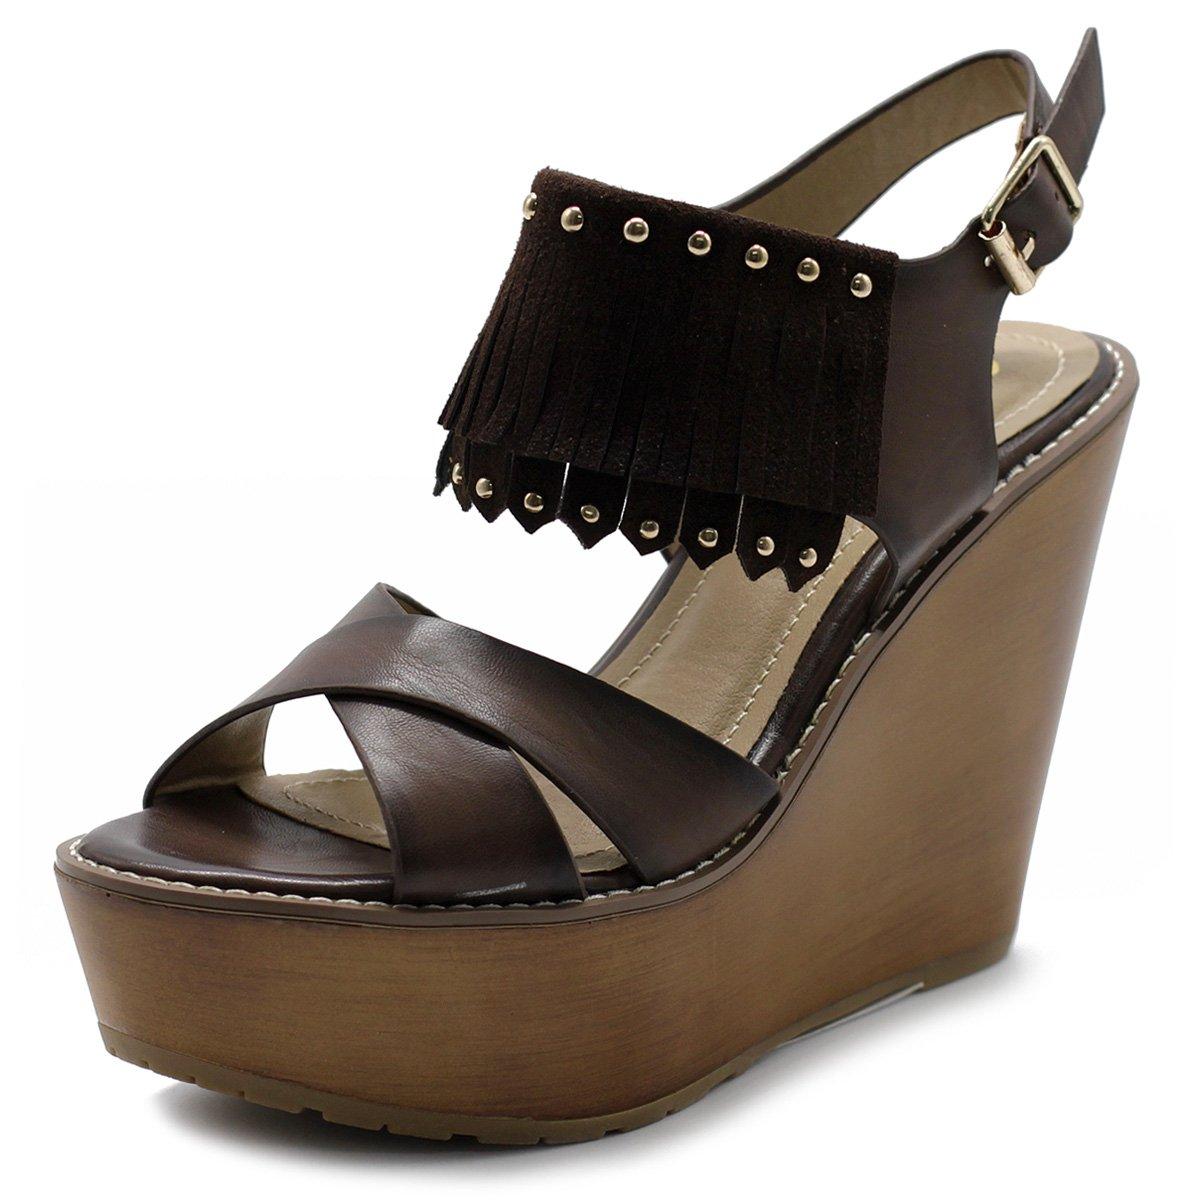 Ollio Womens Shoe Burnish Vintage Faded Fringe Wedge Heel Sandal B01CPOALUW 8.5 B(M) US|Brown